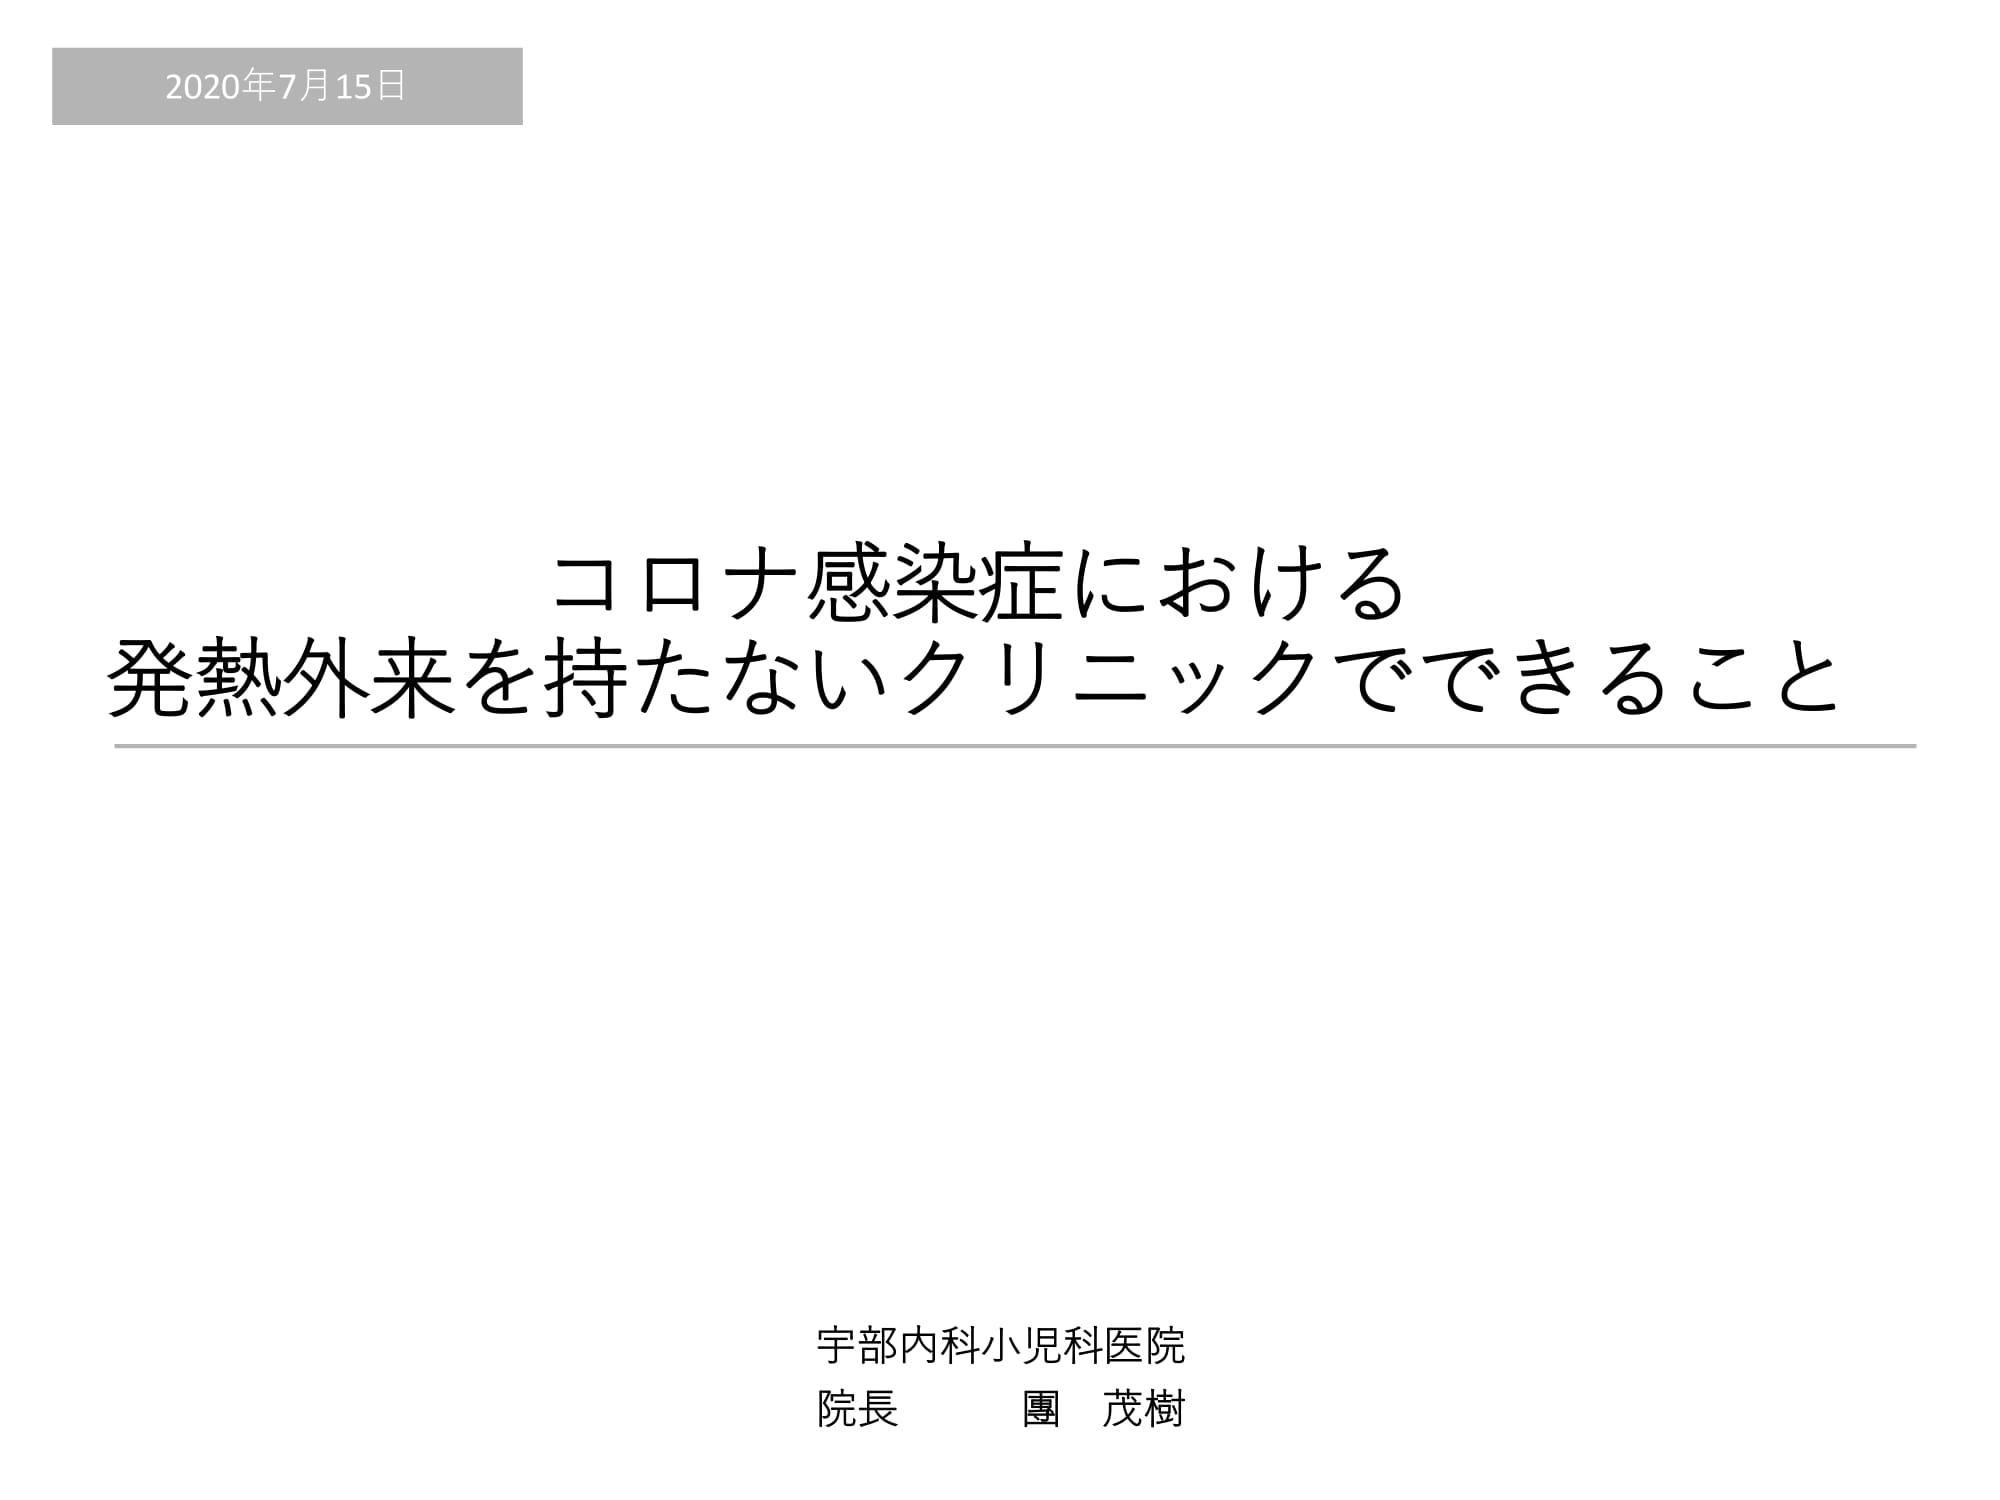 COVID-19_01.jpg